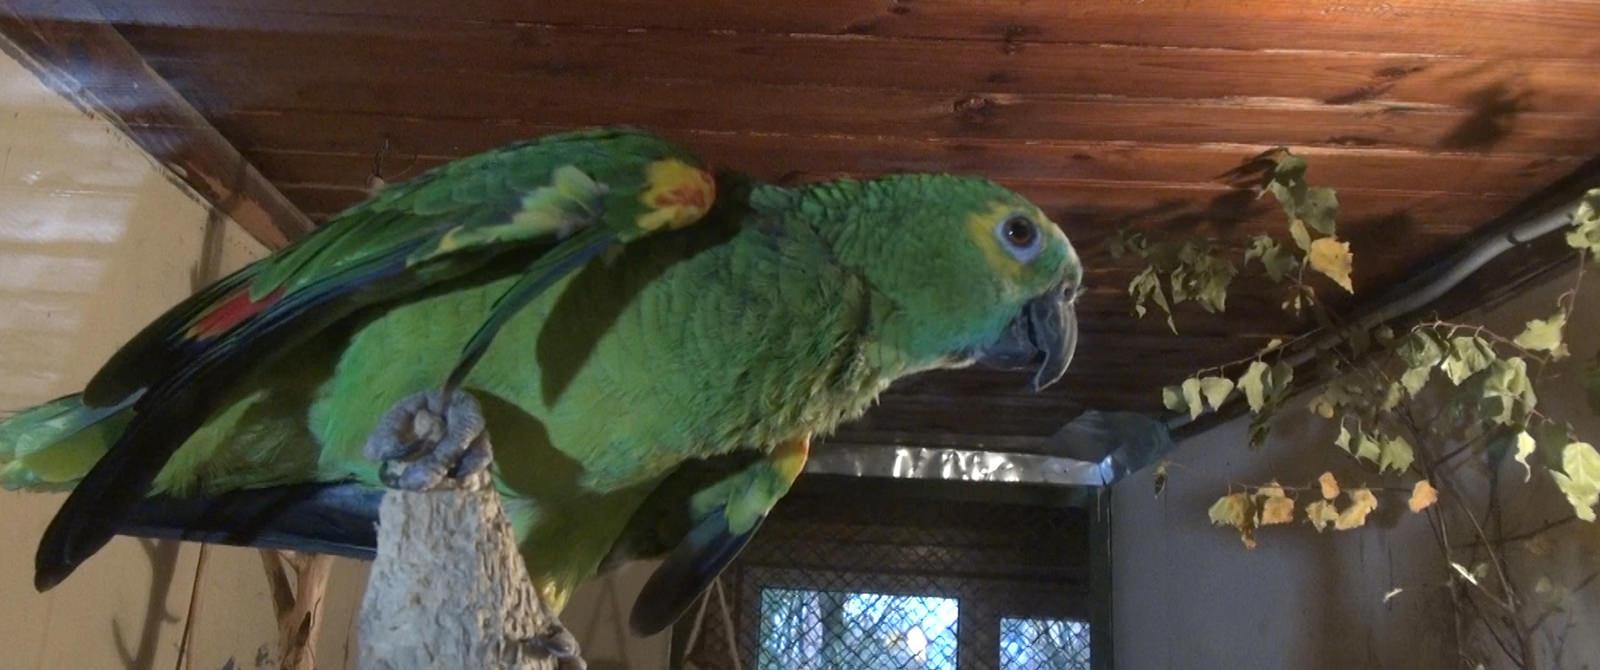 Papūga - mėlynkaktė amazonė